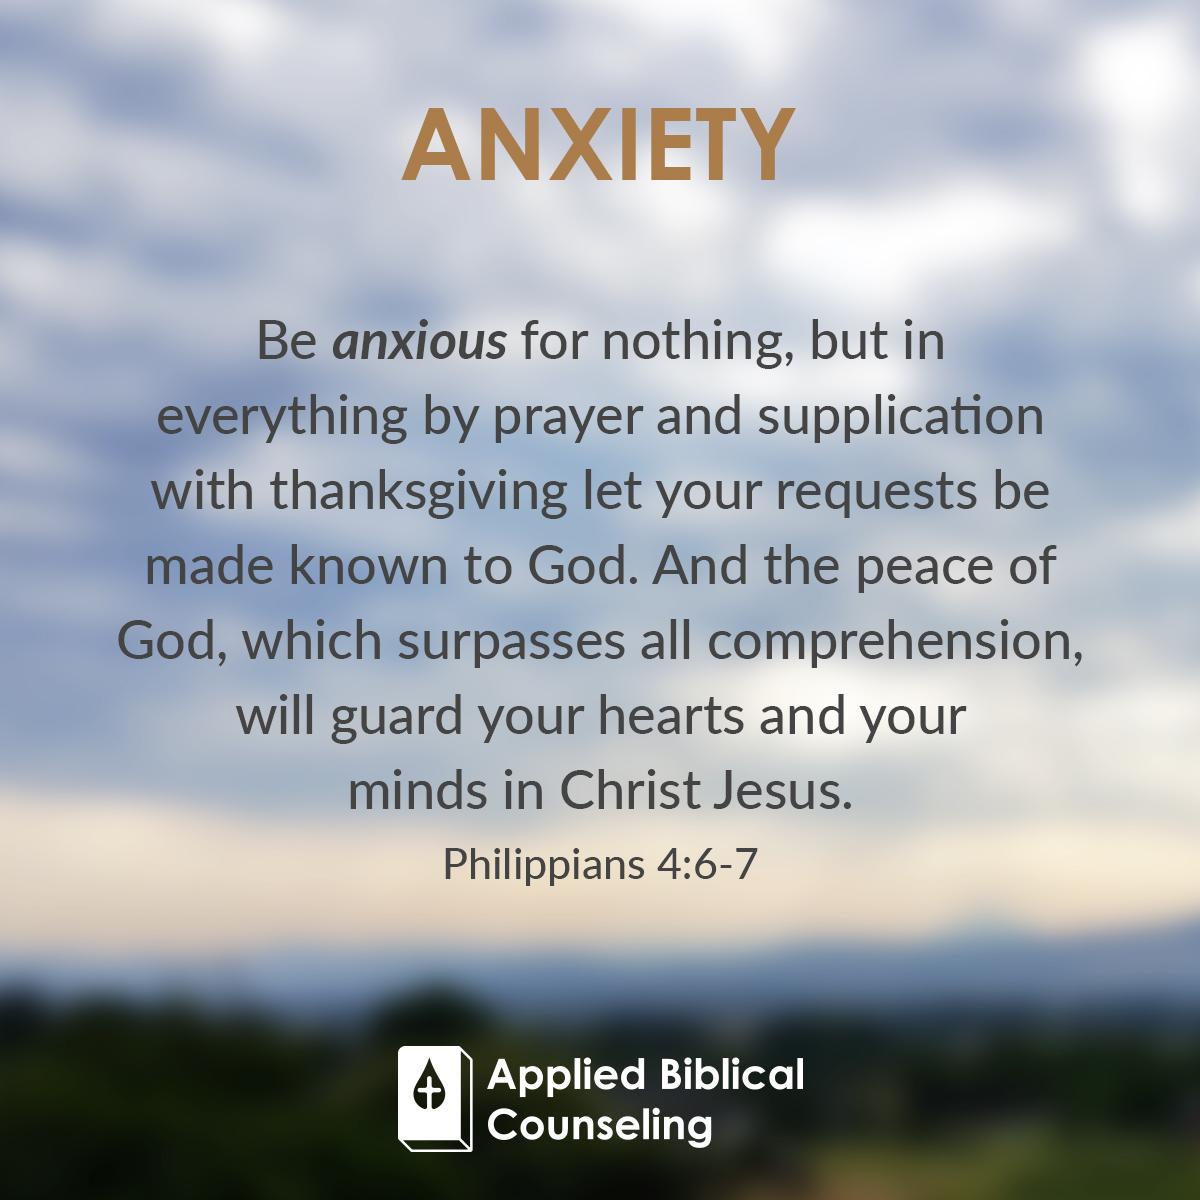 ABC_Facebook-w8-anxiety-2